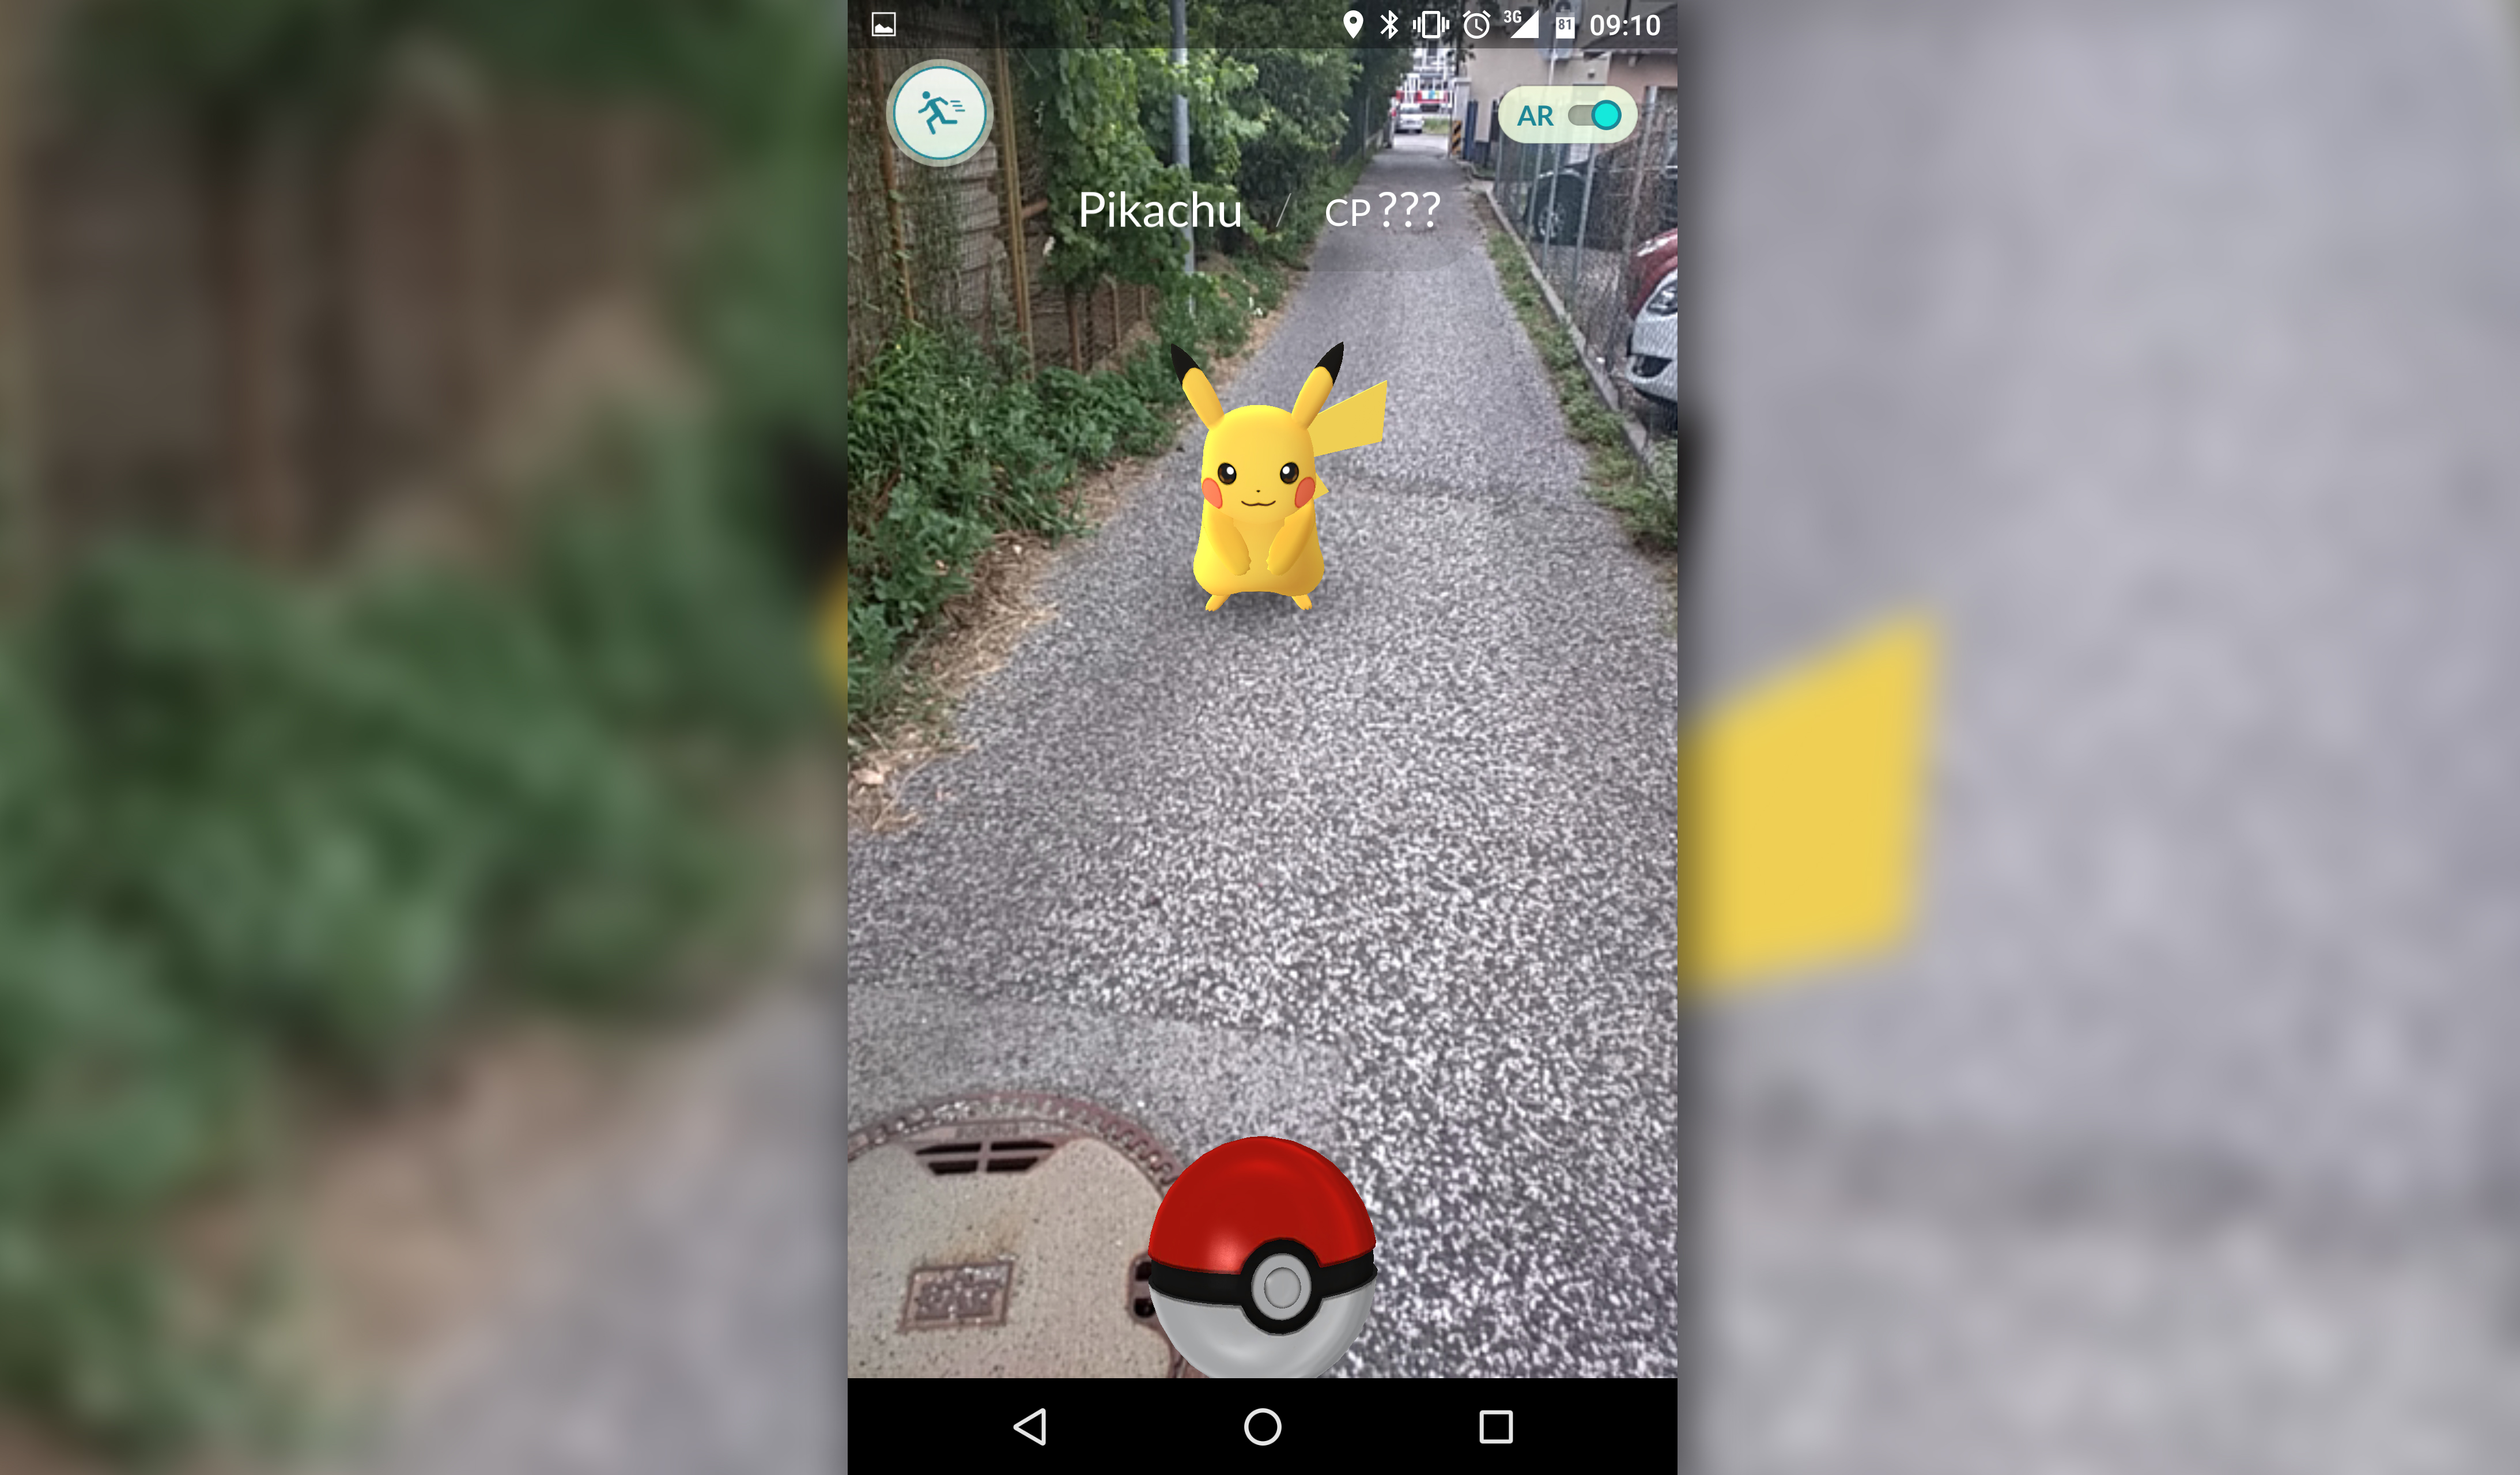 pikachu detrás de mi casa